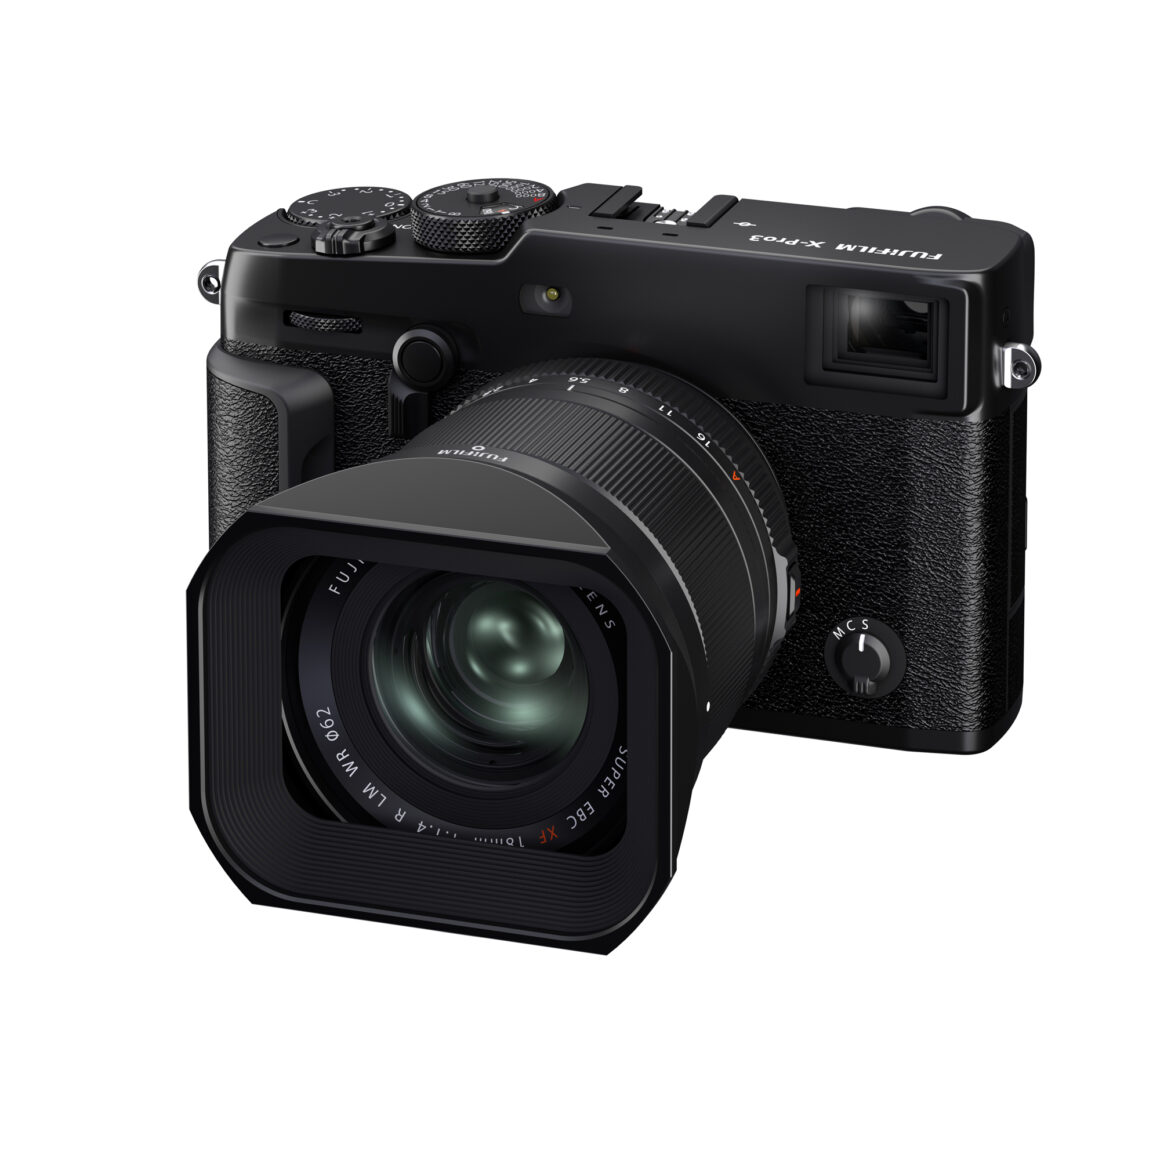 Das Fujinon XF 18mm f/1.4 R LM WR mit Gegenlichtblende LH-XF18 an einer Fujifilm X Pro3